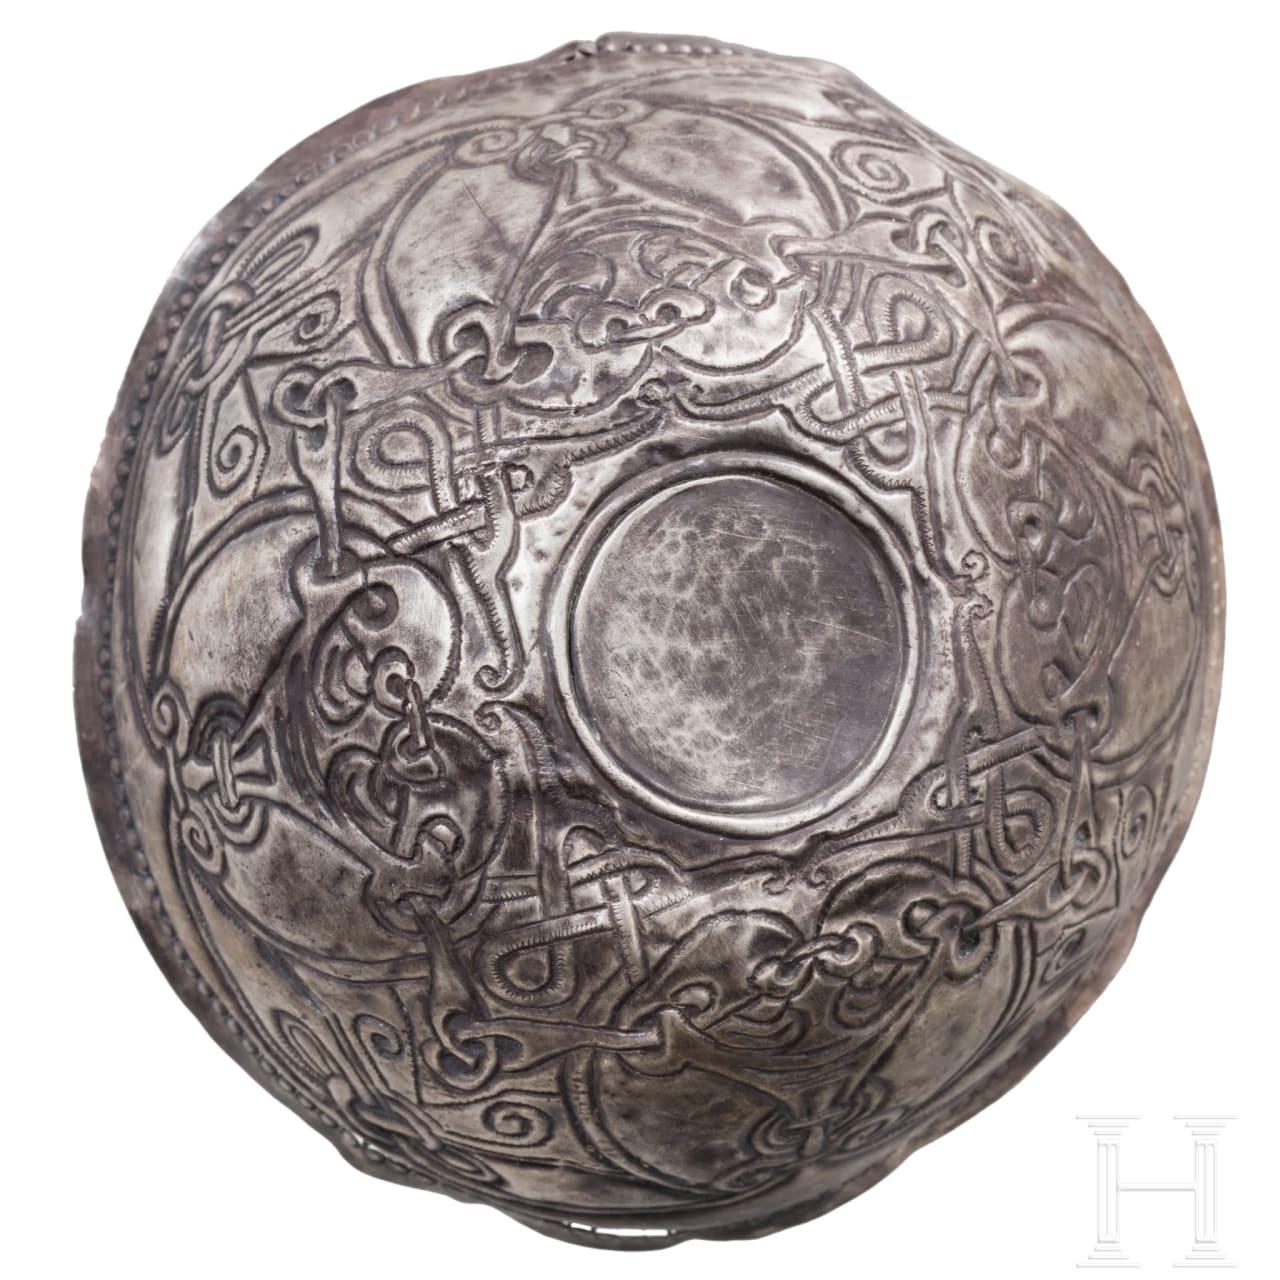 A Viking silver bowl, 9th - 10th century